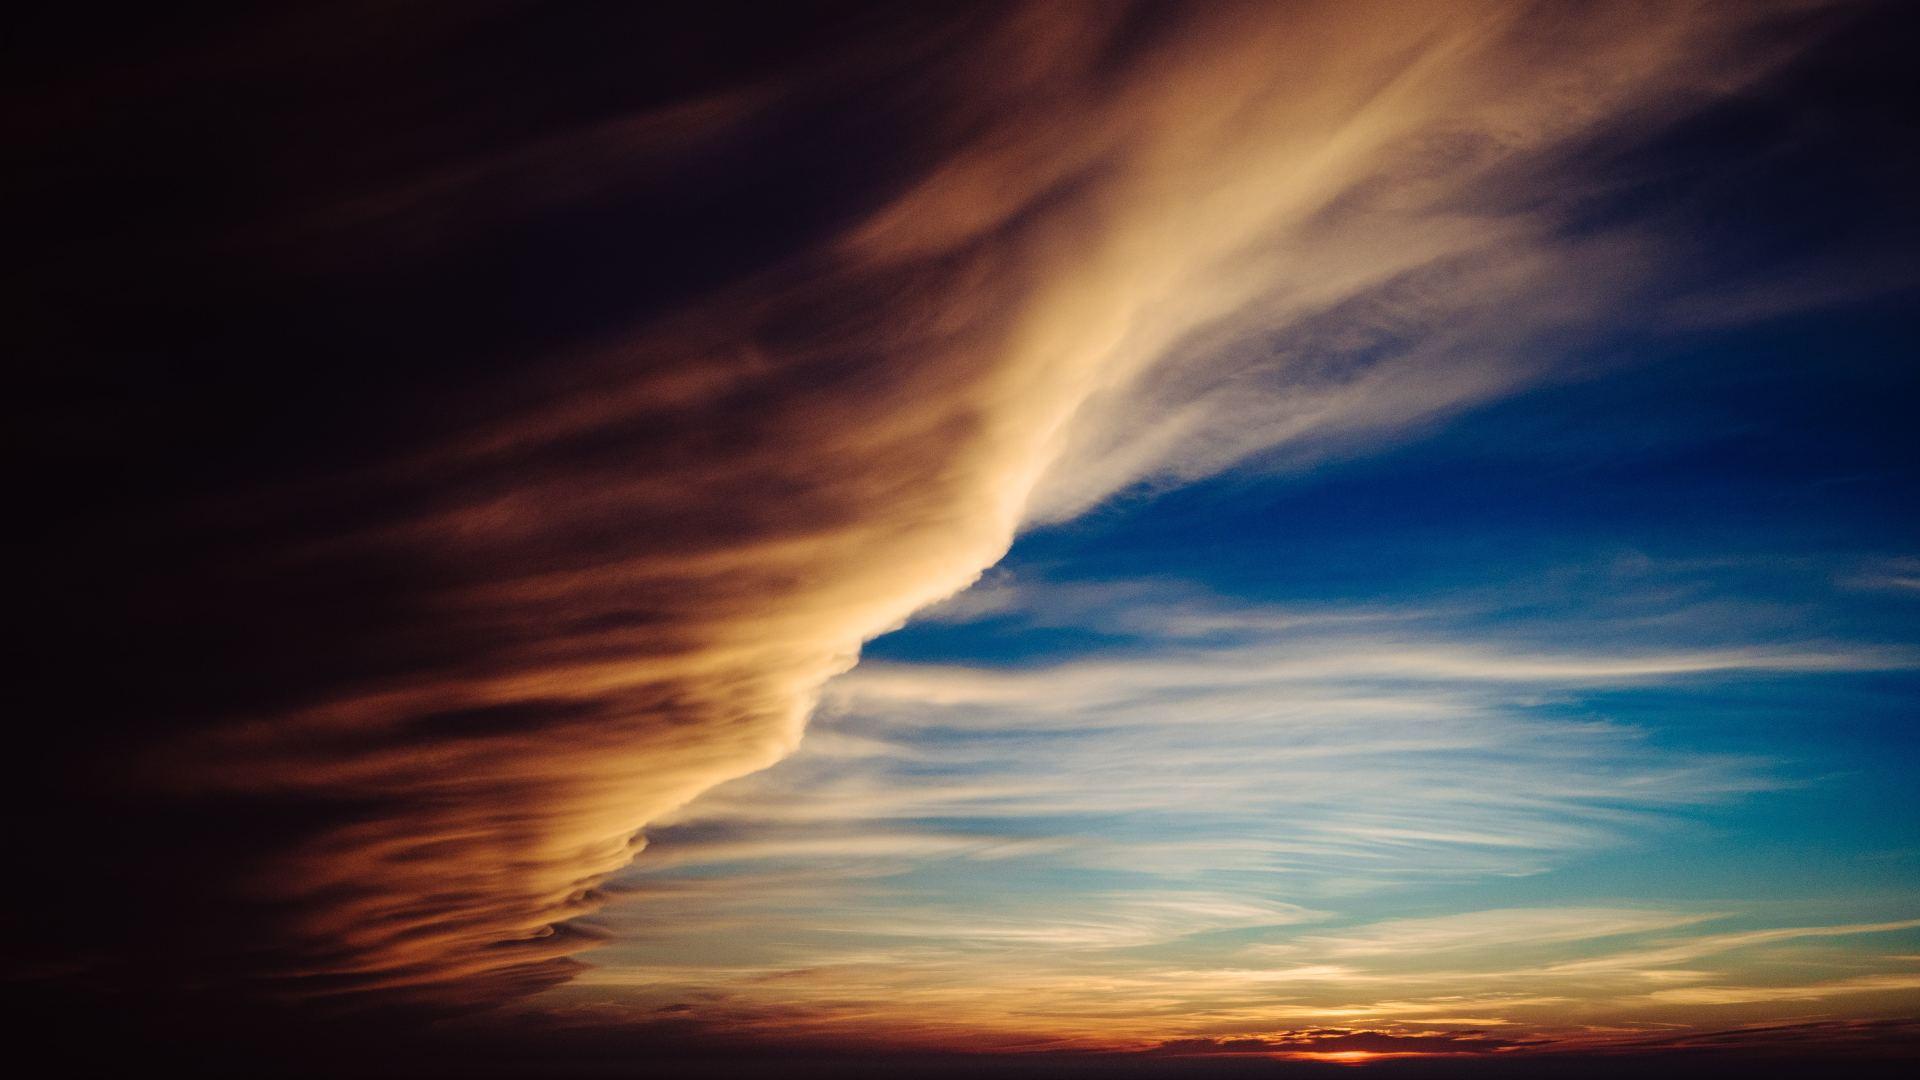 1920x1080 Clouds Like Cyclone 1080P Laptop Full HD Wallpaper HD 1920x1080